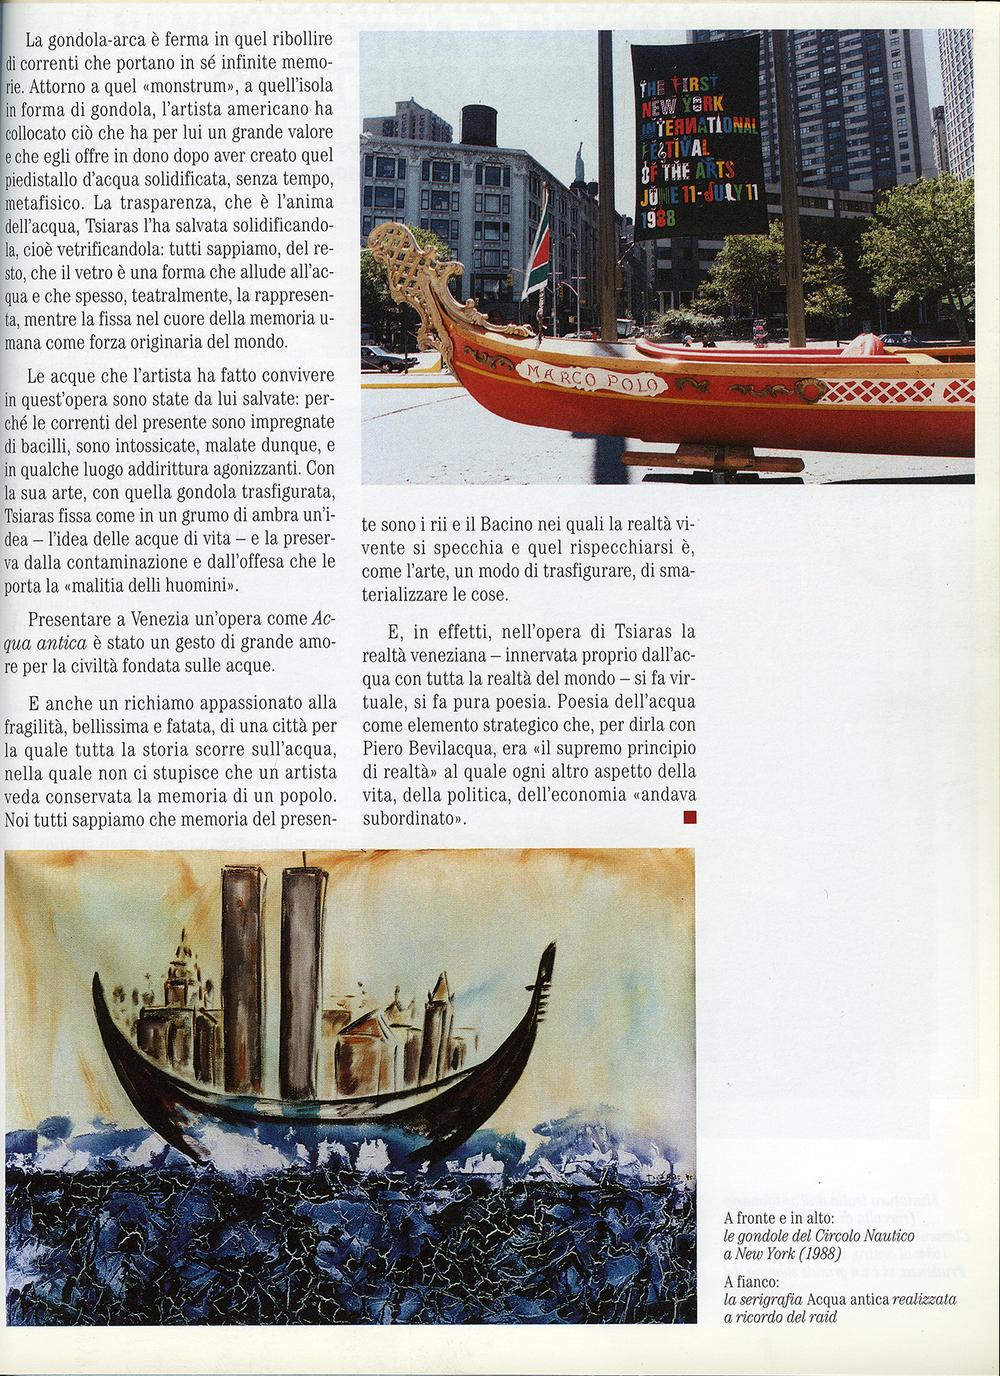 Il-Bolletino-7-95-pg-02.jpg